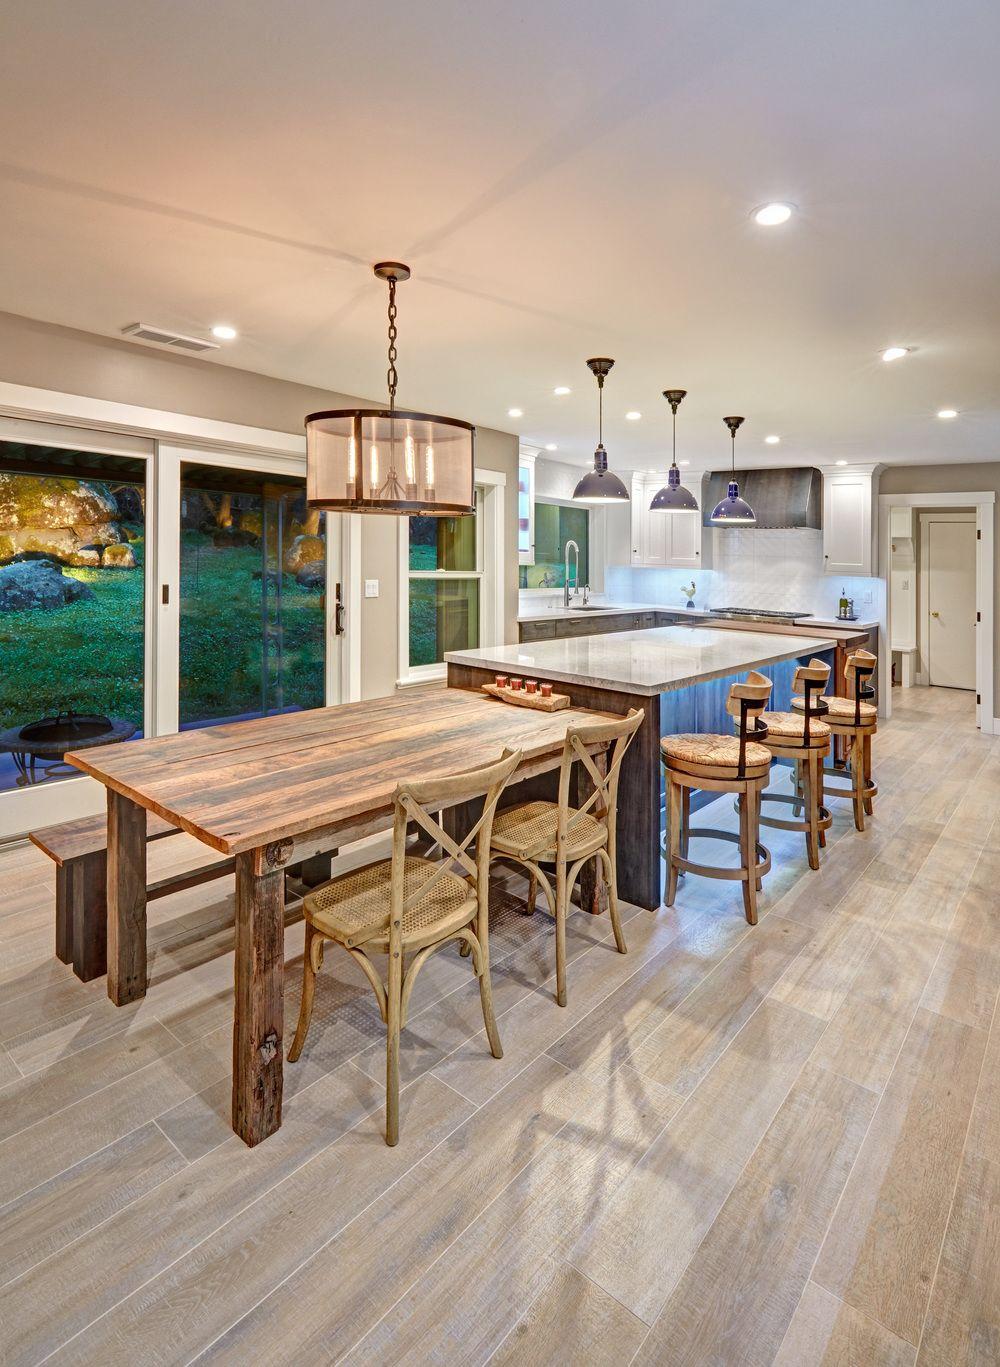 Loomis Industrial Eclectic Nar Fine Carpentry Sacramento El Beauteous Eldorado Dining Room Review